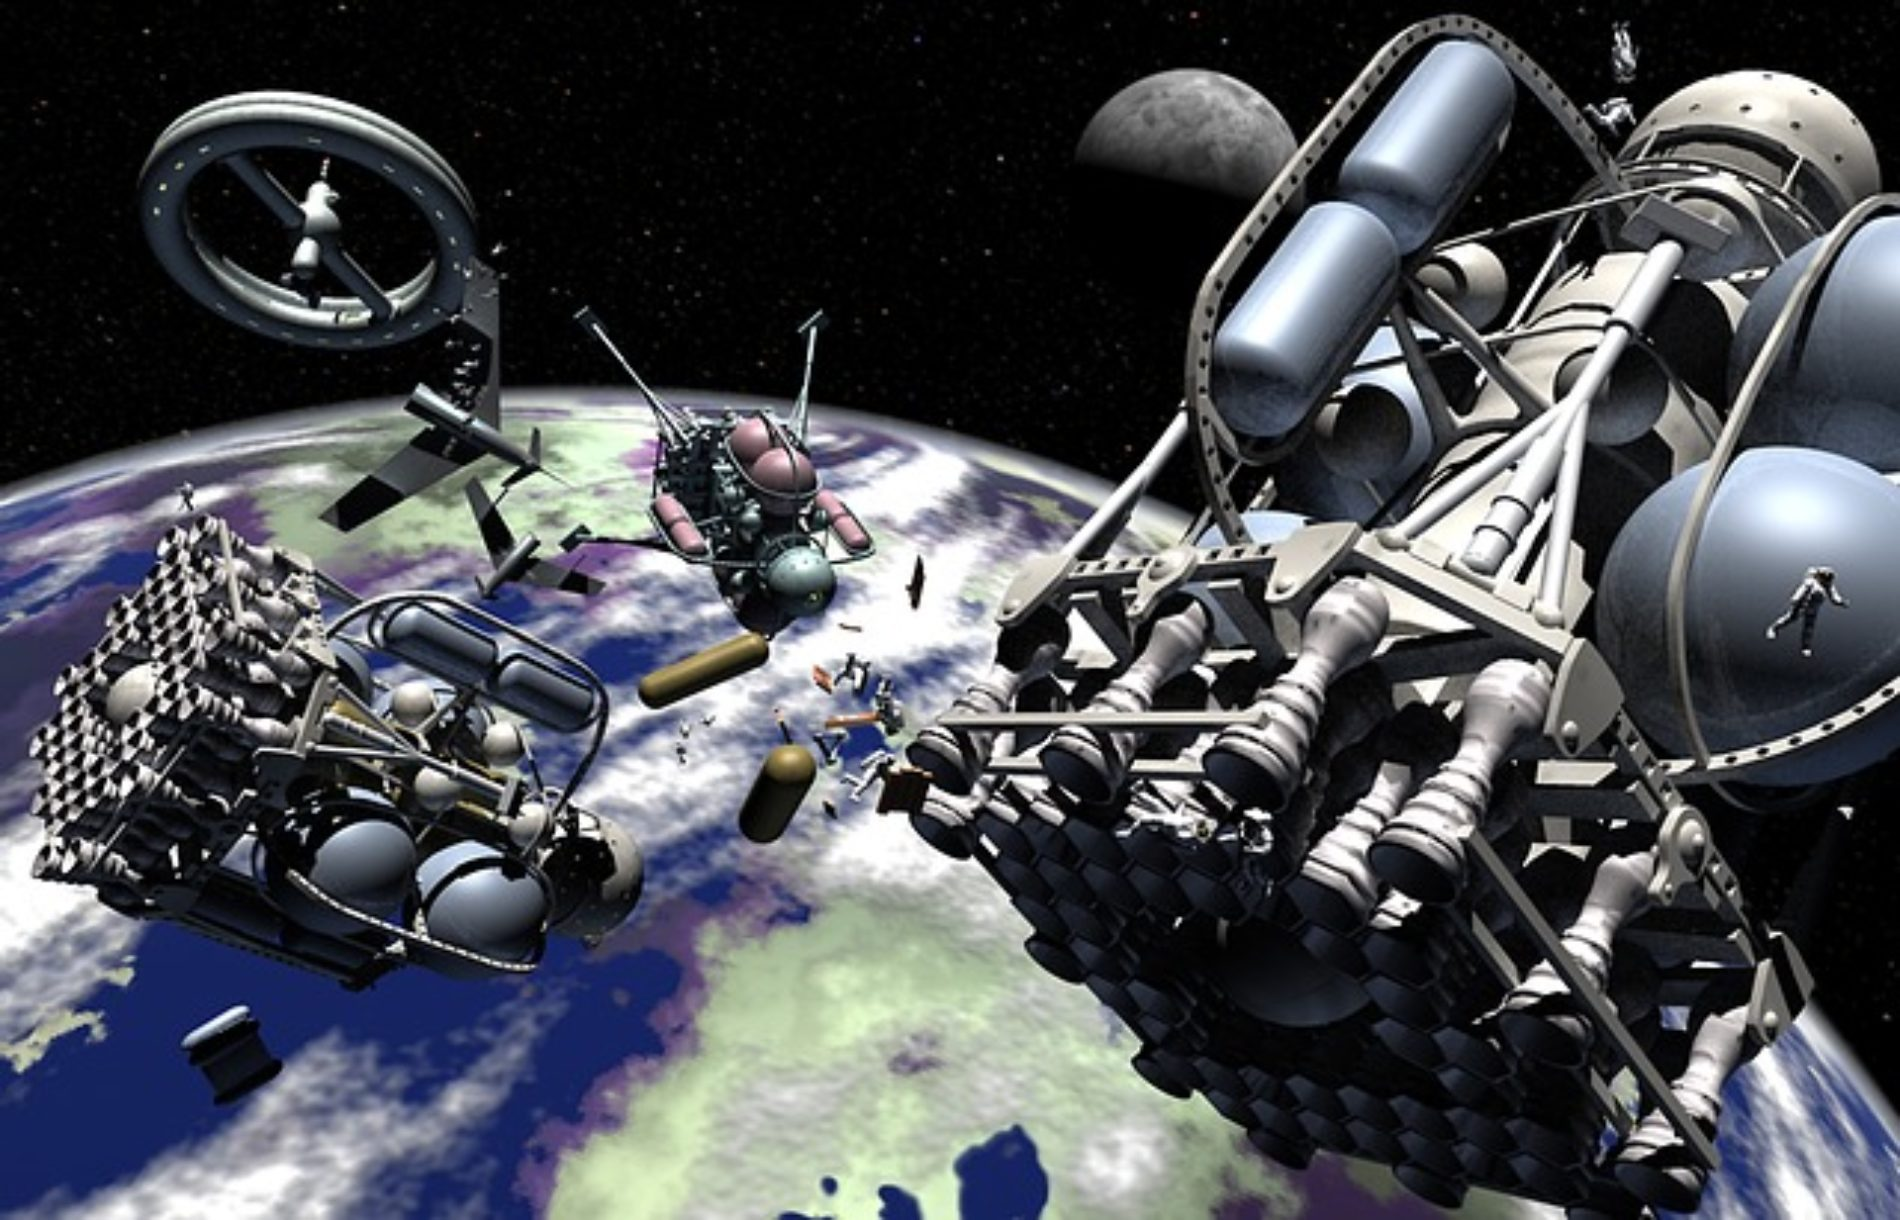 Help NASA create a flying space robot!